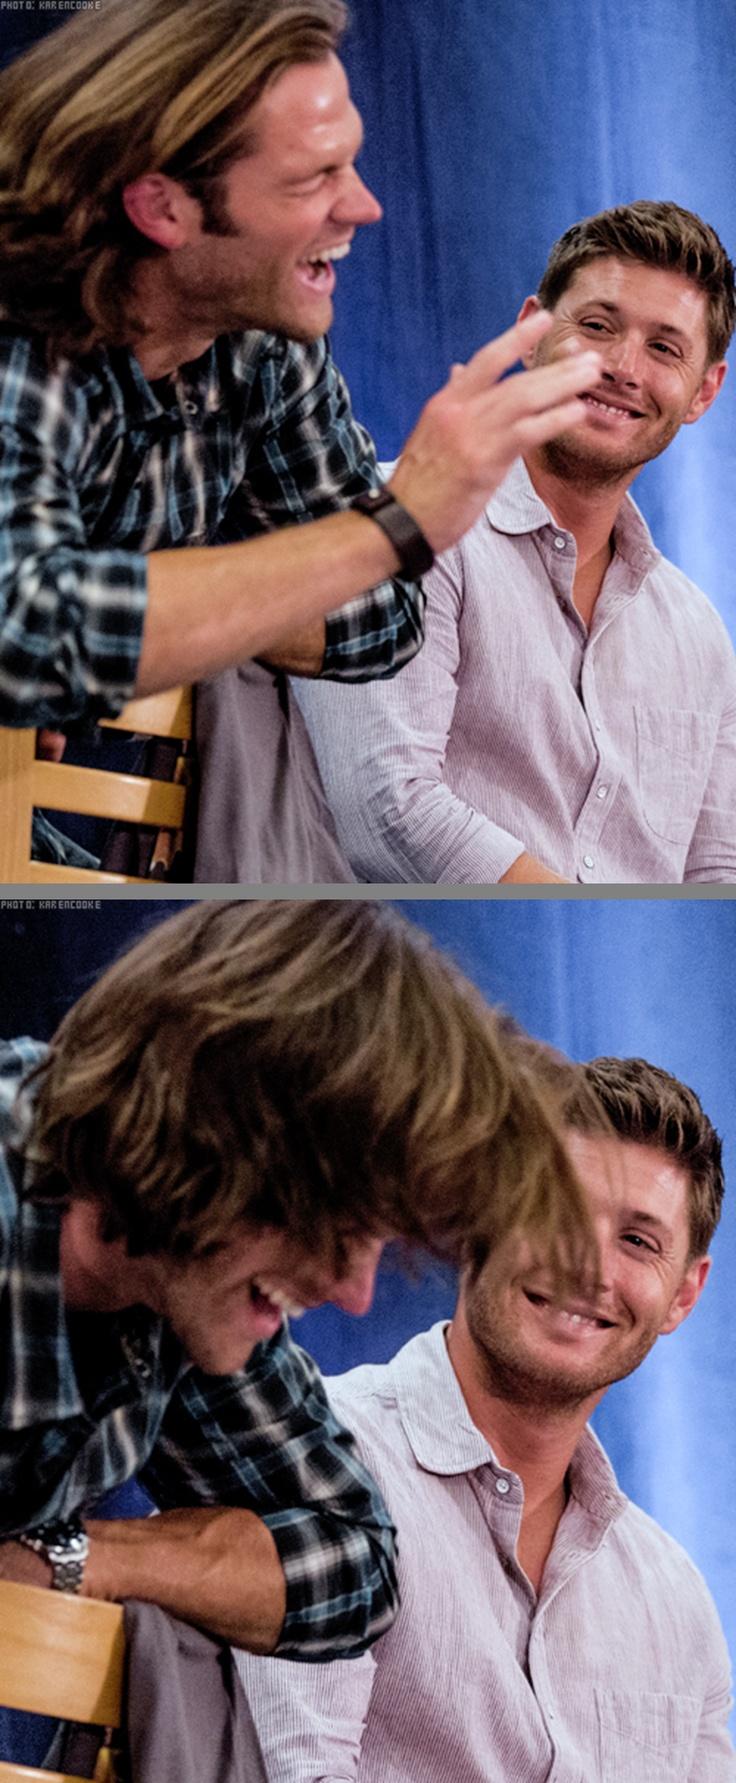 awwww J2 love ♥◡♥ I love it when Jensen takes pleasure in Jared's laughter and viceversa ^_^ || Vancon 2012 #Vancon2012 || Jensen Ackles || Jared Padalecki #Supernatural Convention